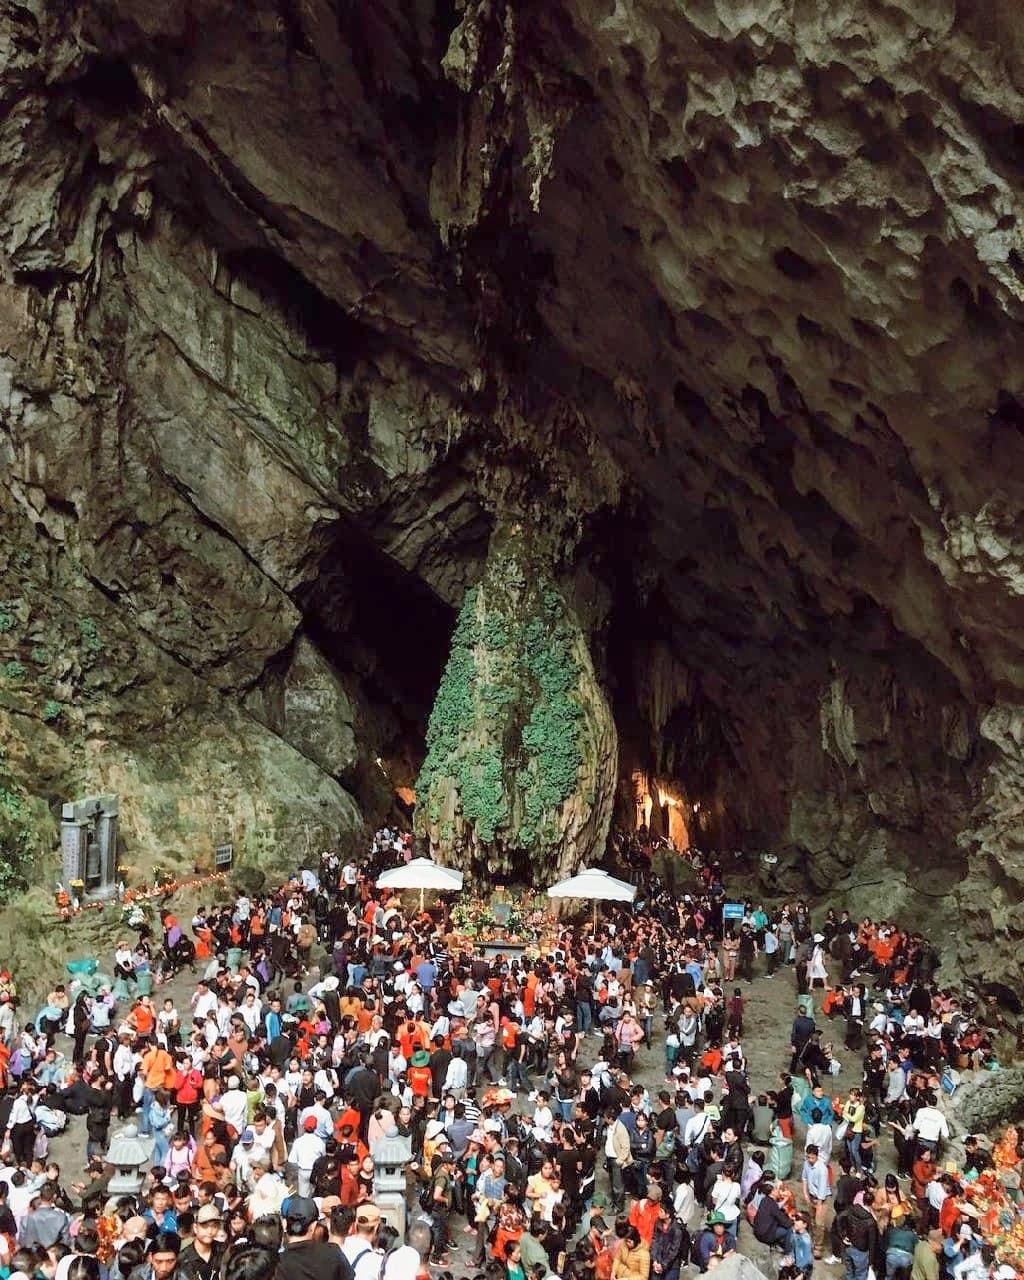 Vietnam pagodas - Hương Tích cave